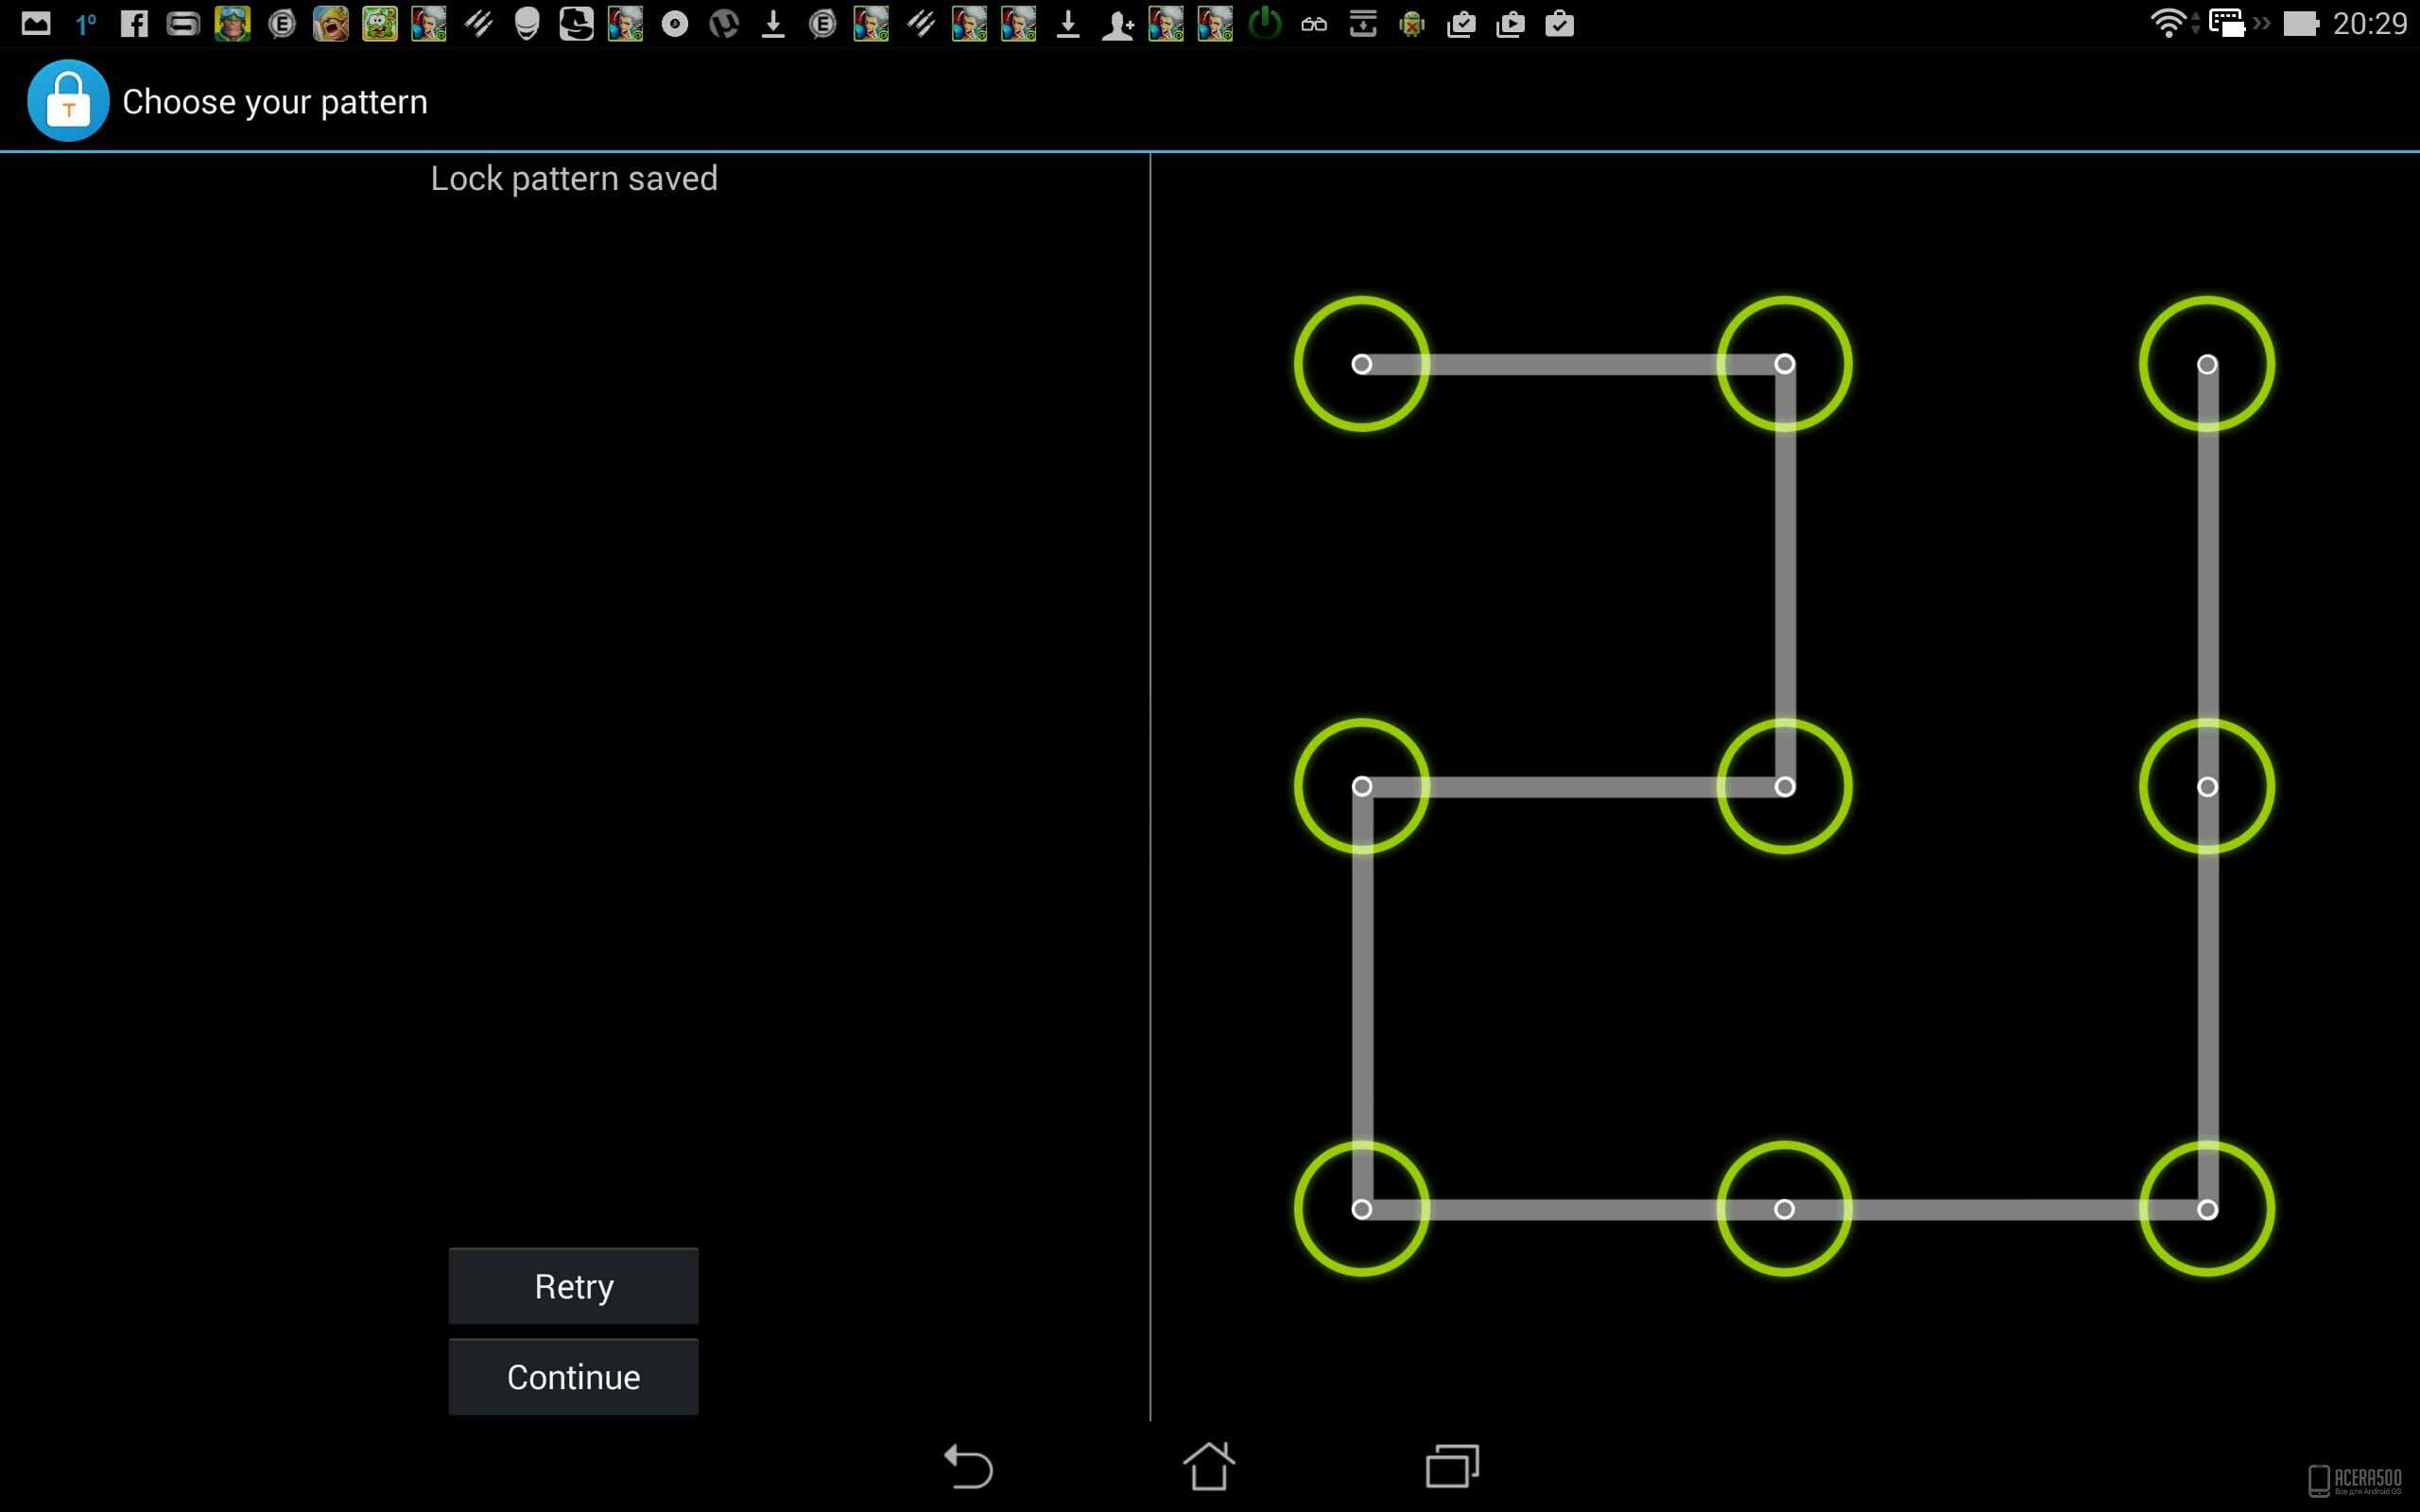 Smart app lock pro onhax